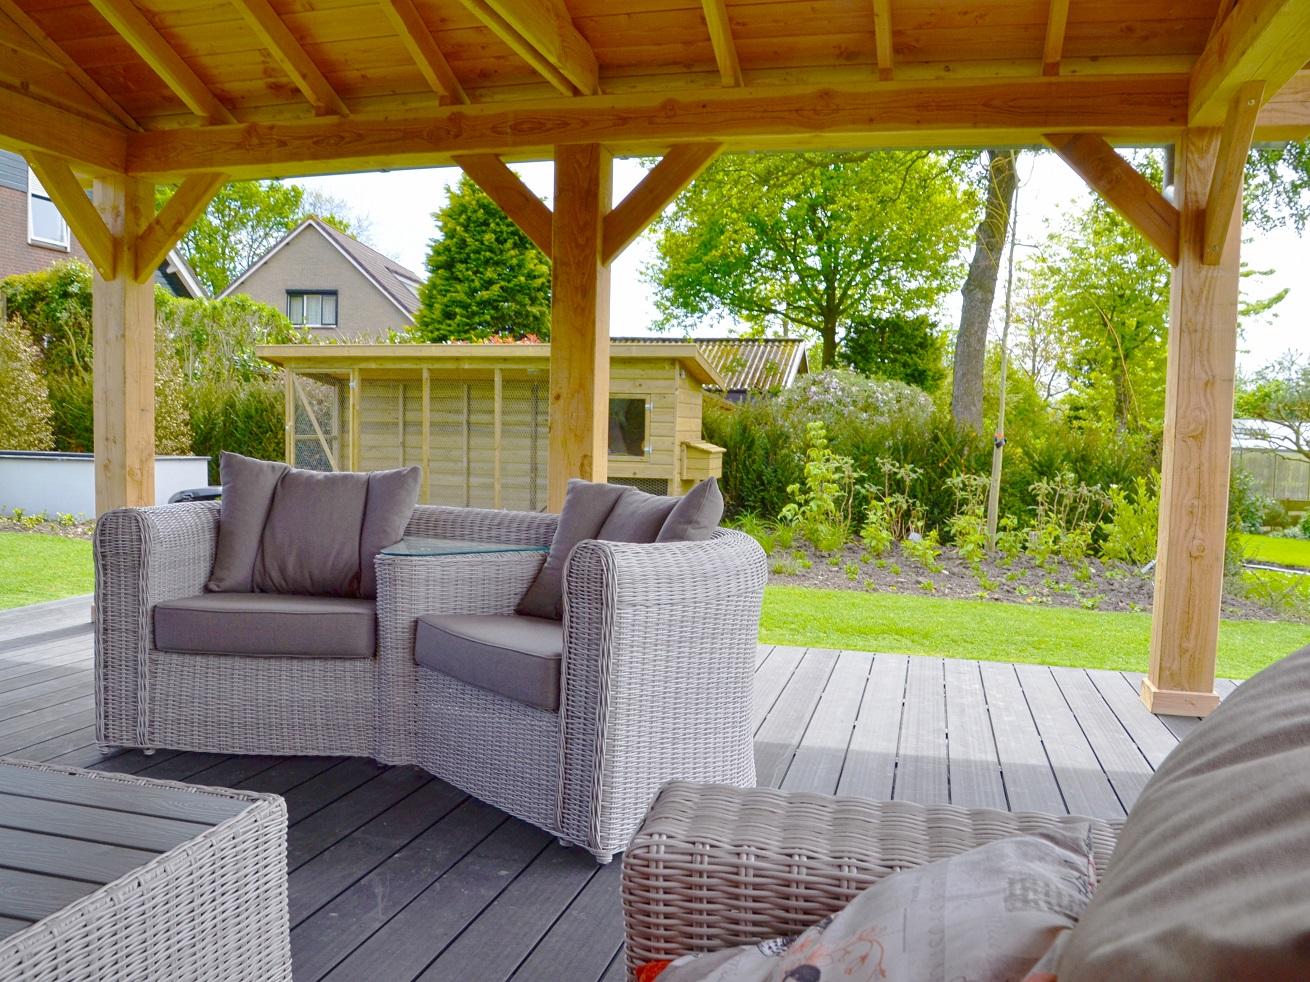 Tuinaanleg: moderne loungetuin met strak keramisch terras